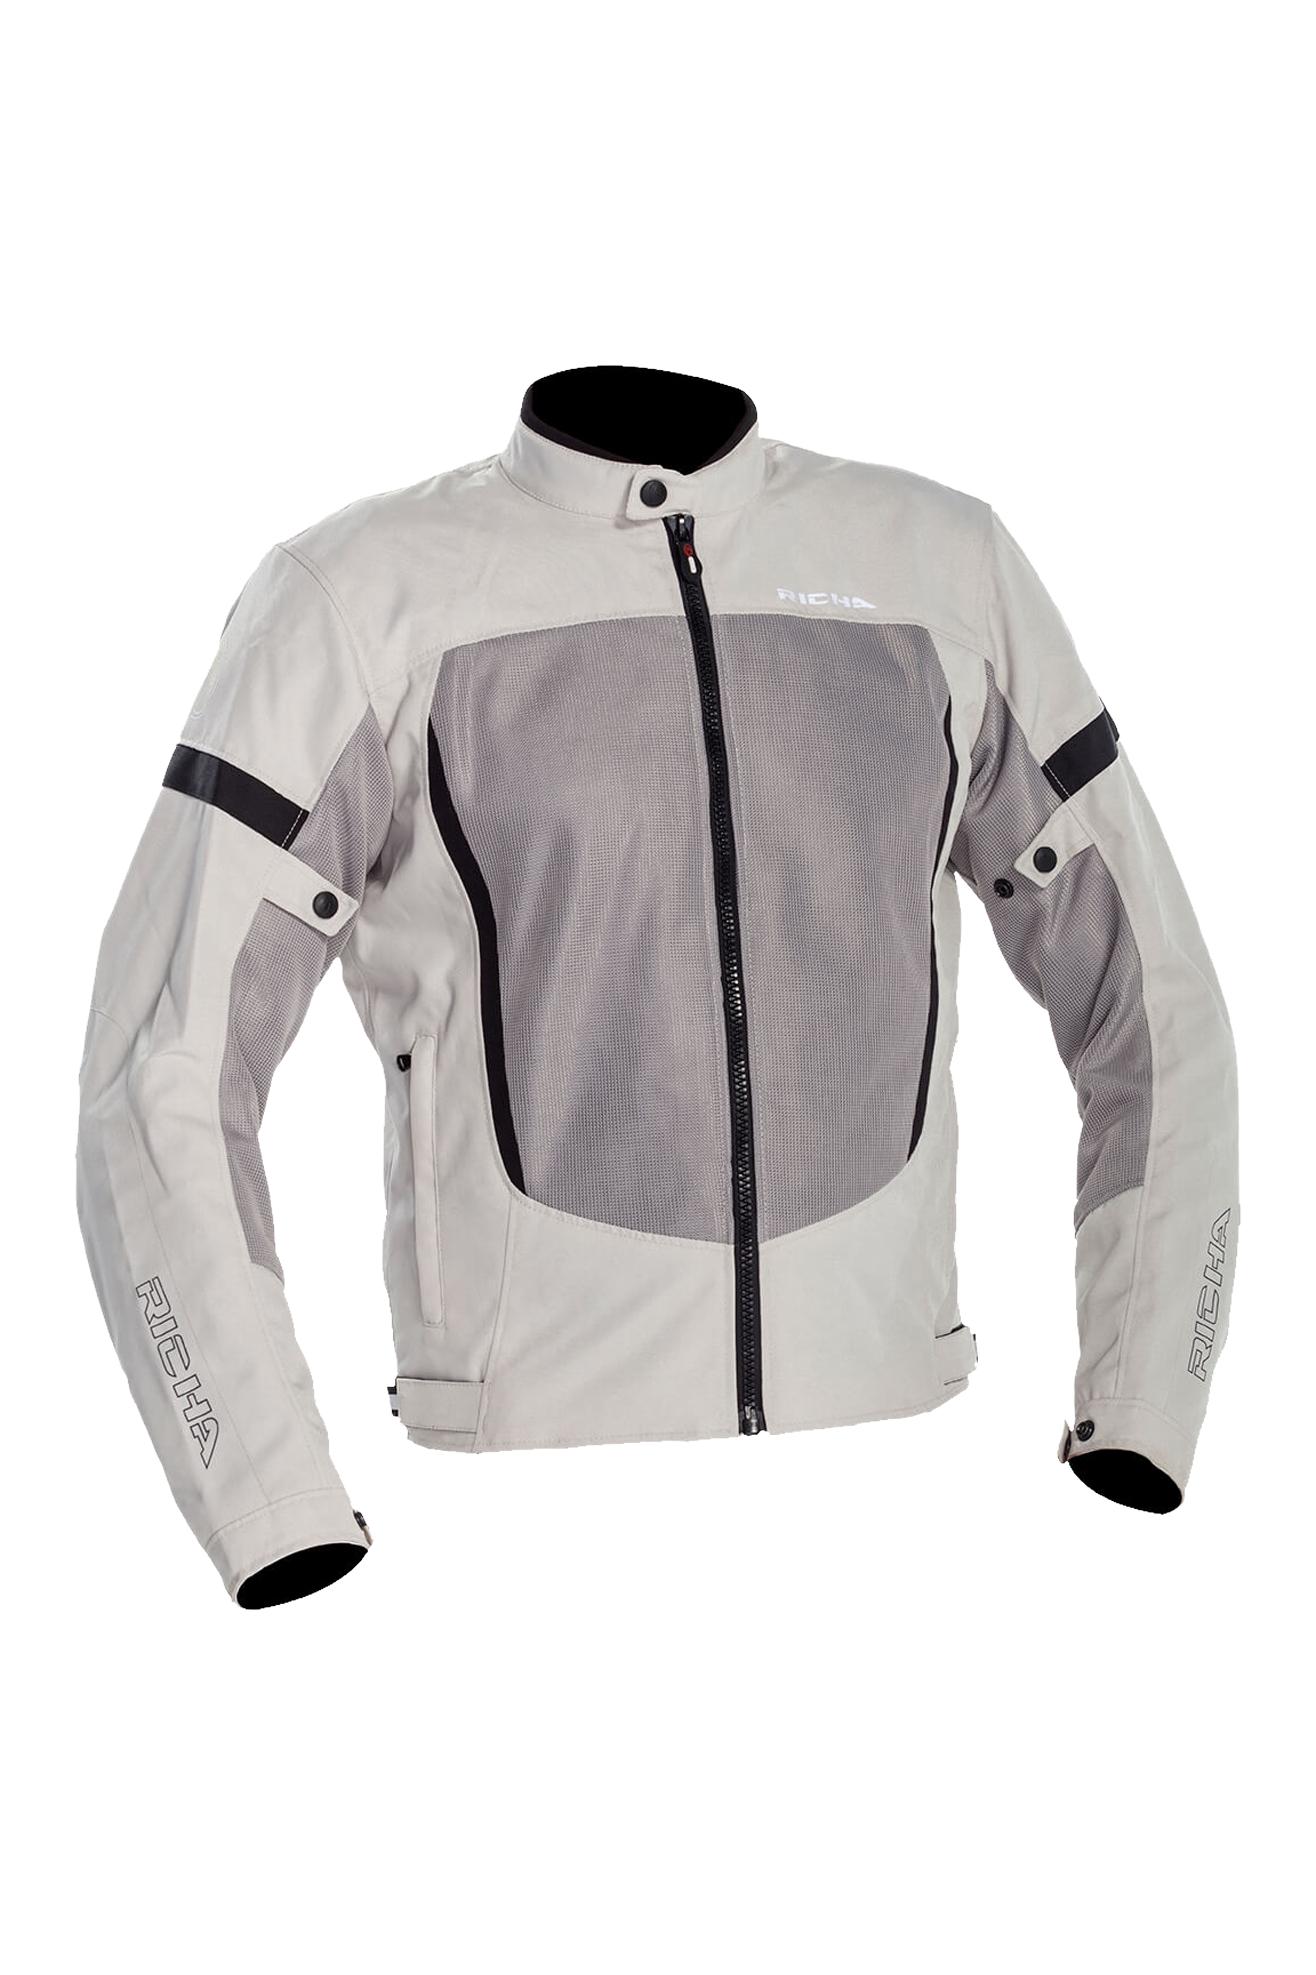 richa giacca moto  airbender grigio